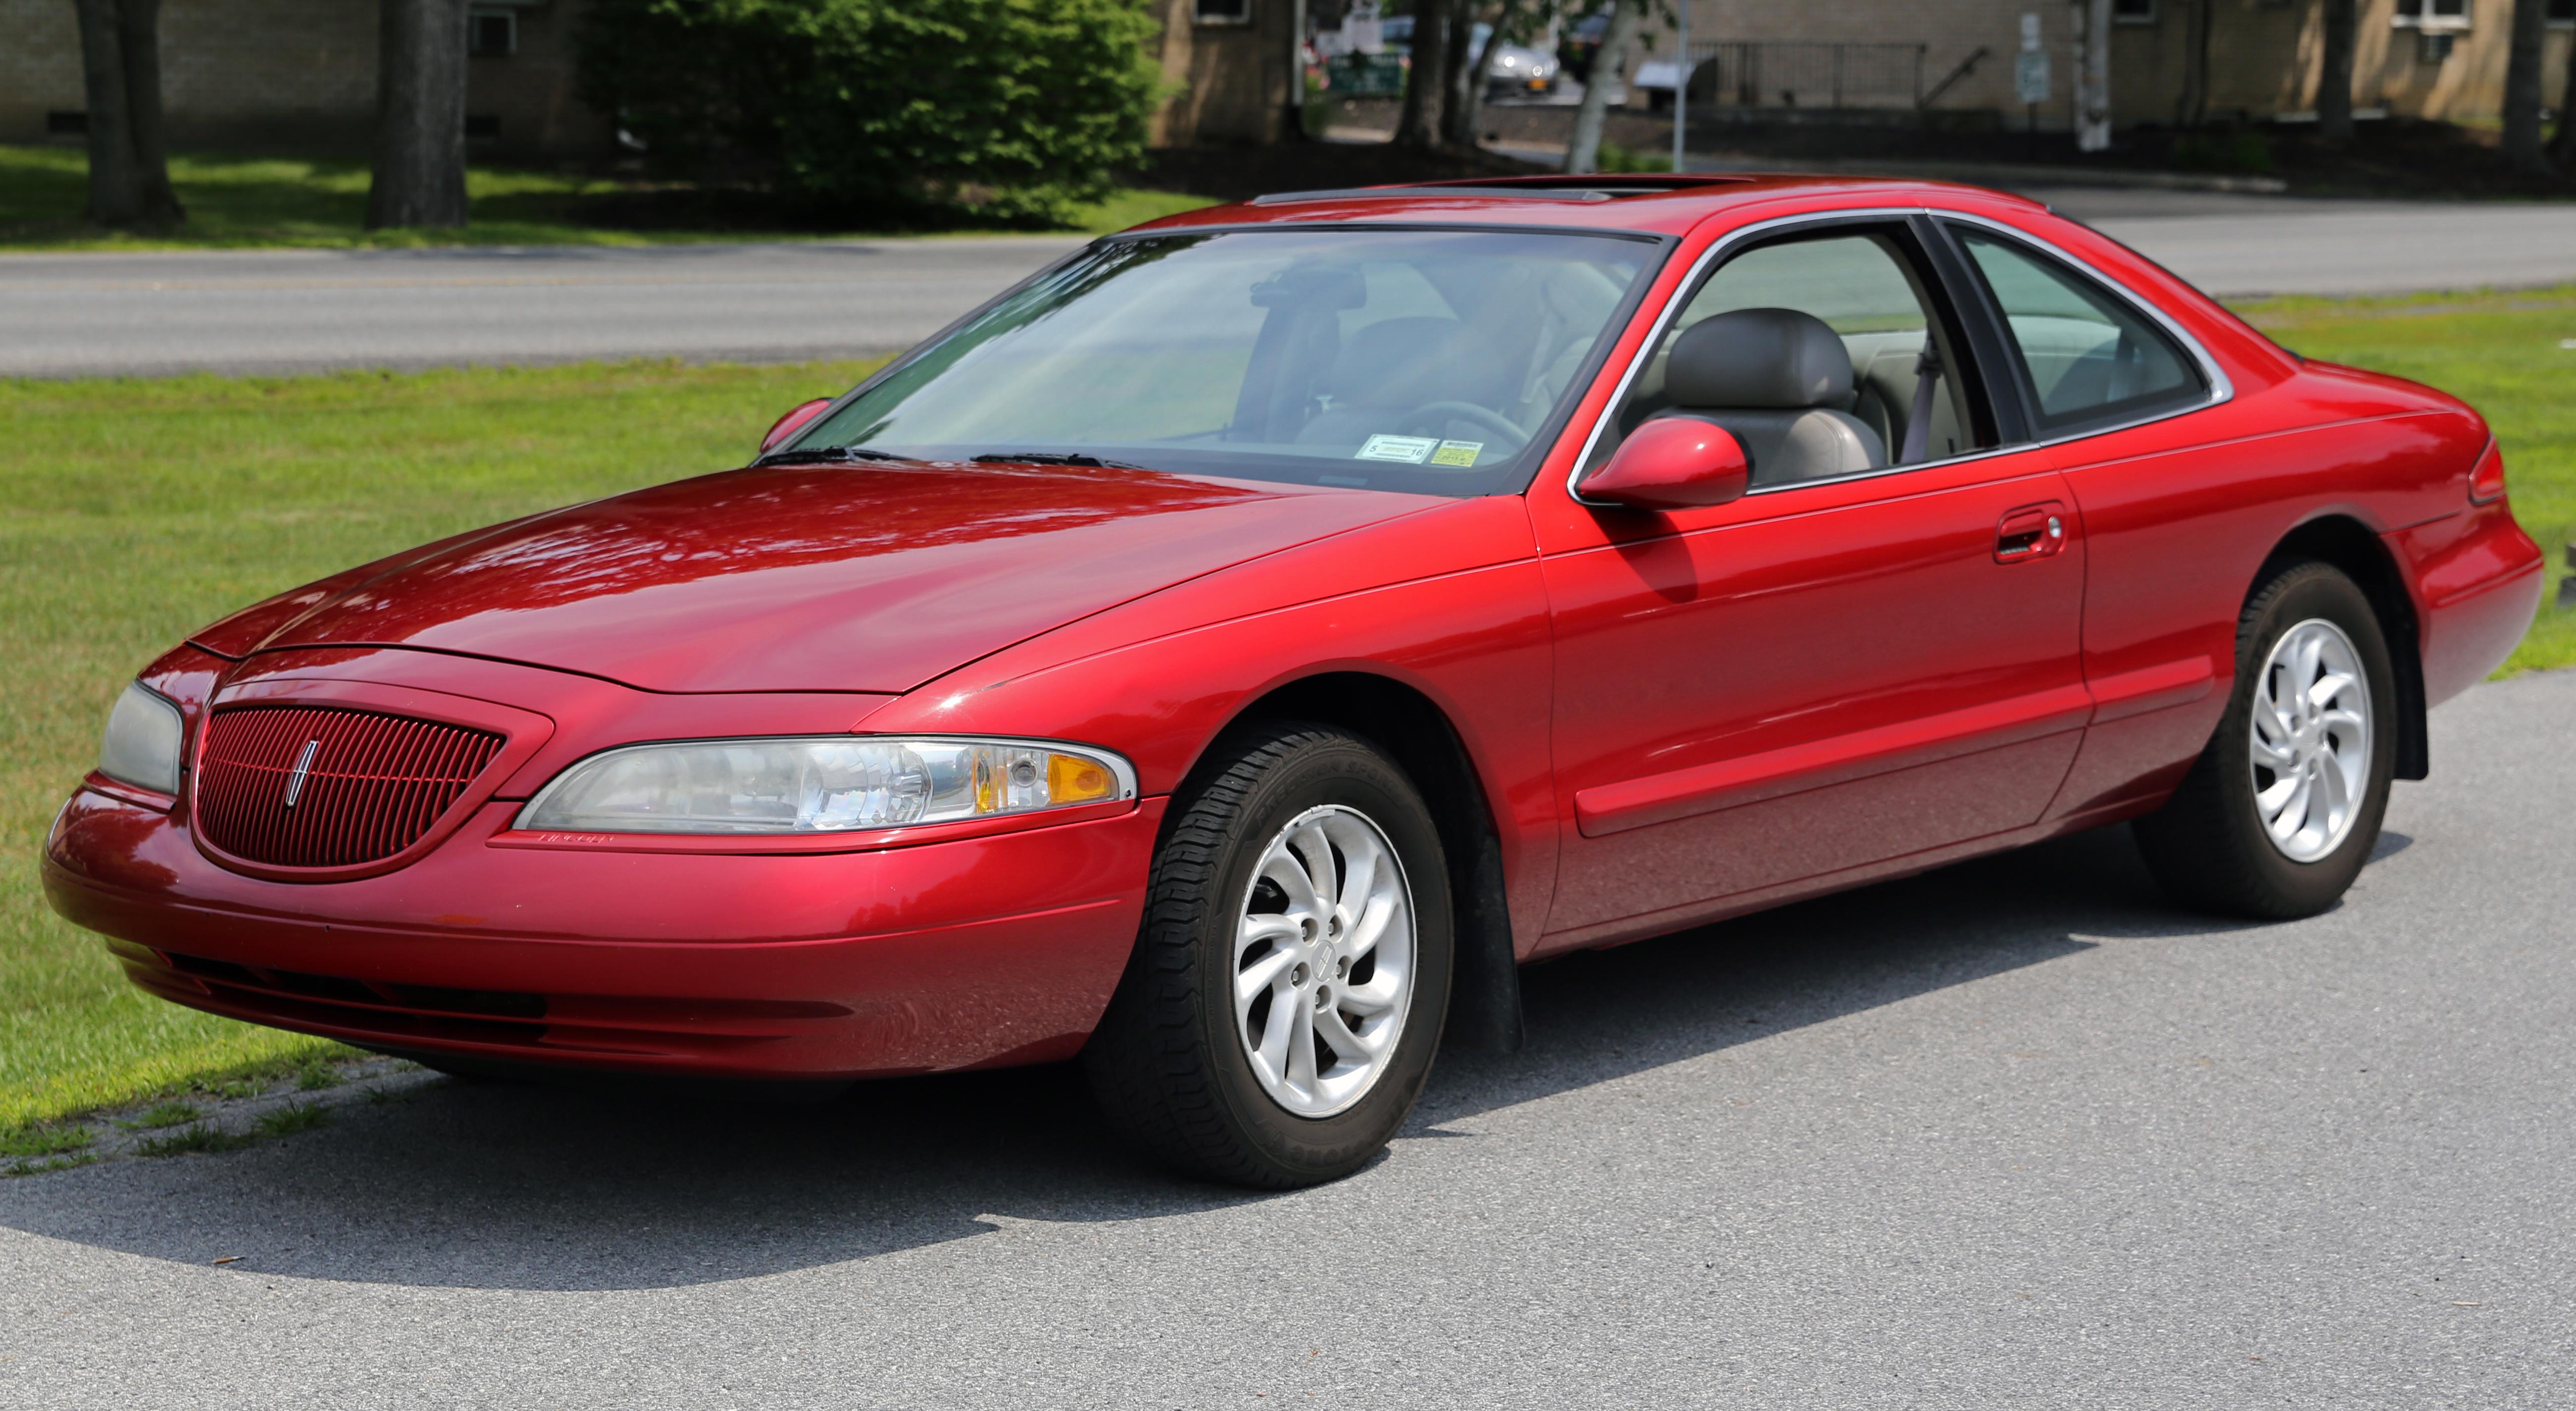 Mercury Cougar VIII 1998 - 2002 Coupe #3